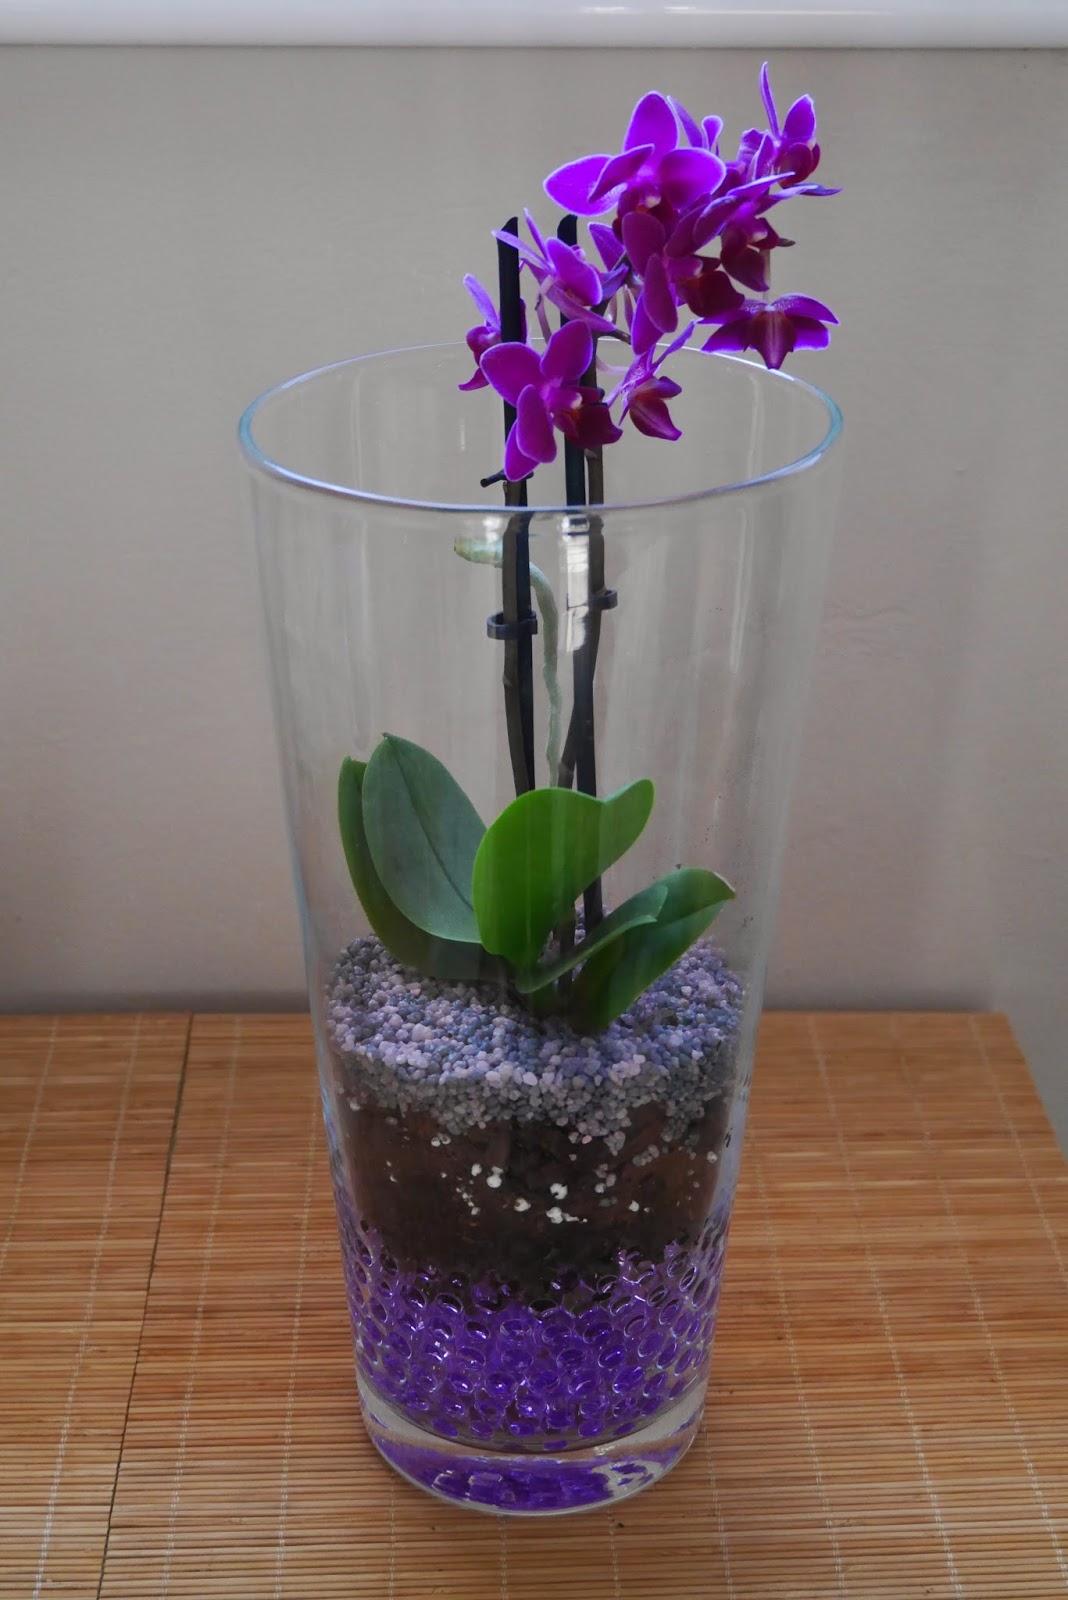 orqudea mariposa mini plantada en gel dentro de jarrn de cristal